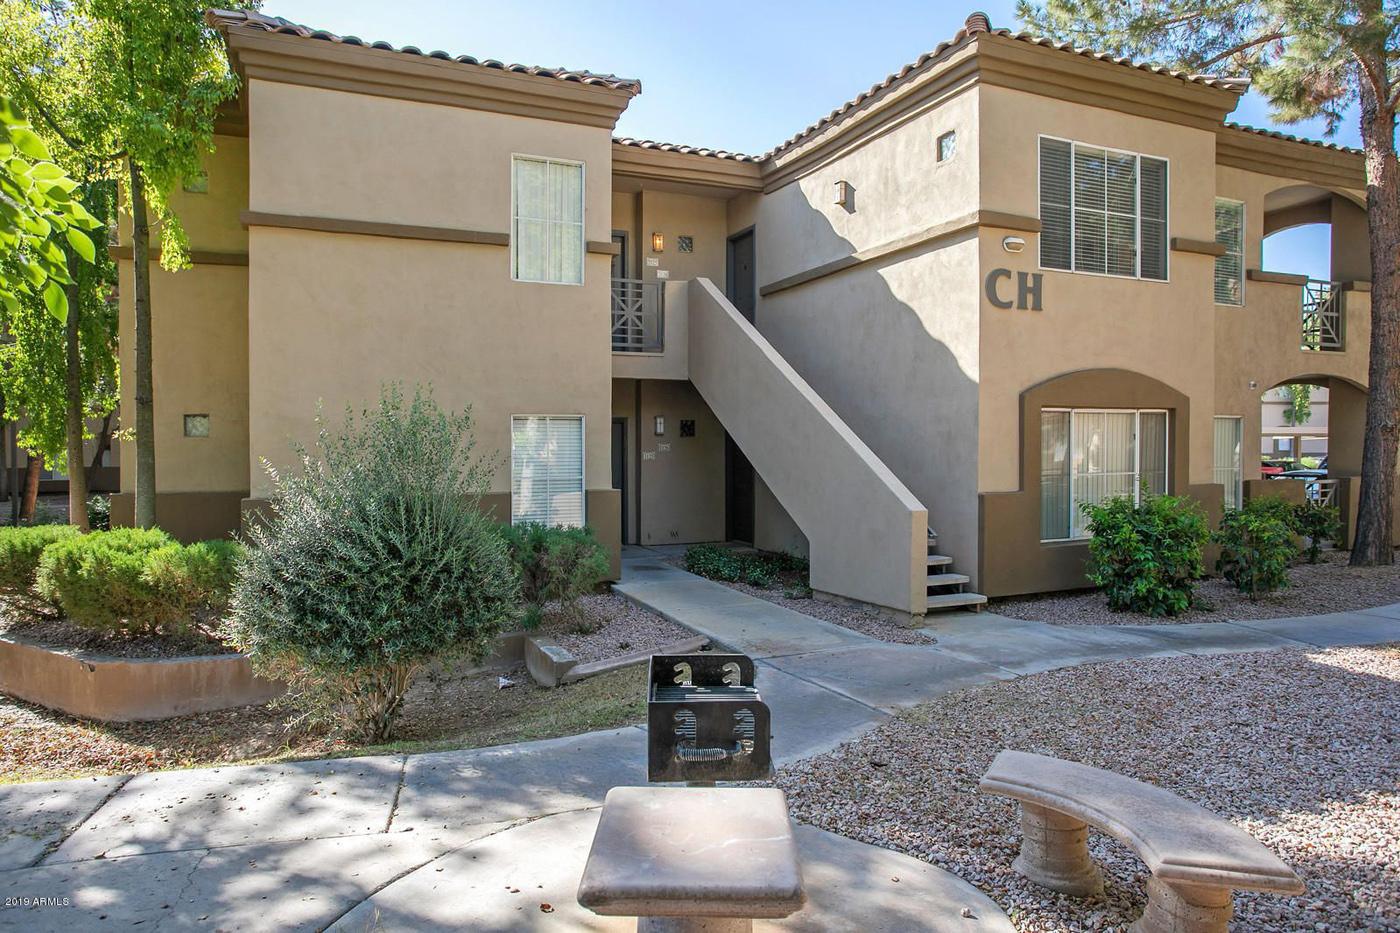 Signature Place in Tempe, Arizona, sold for more than $207,600 per unit. (CoStar)